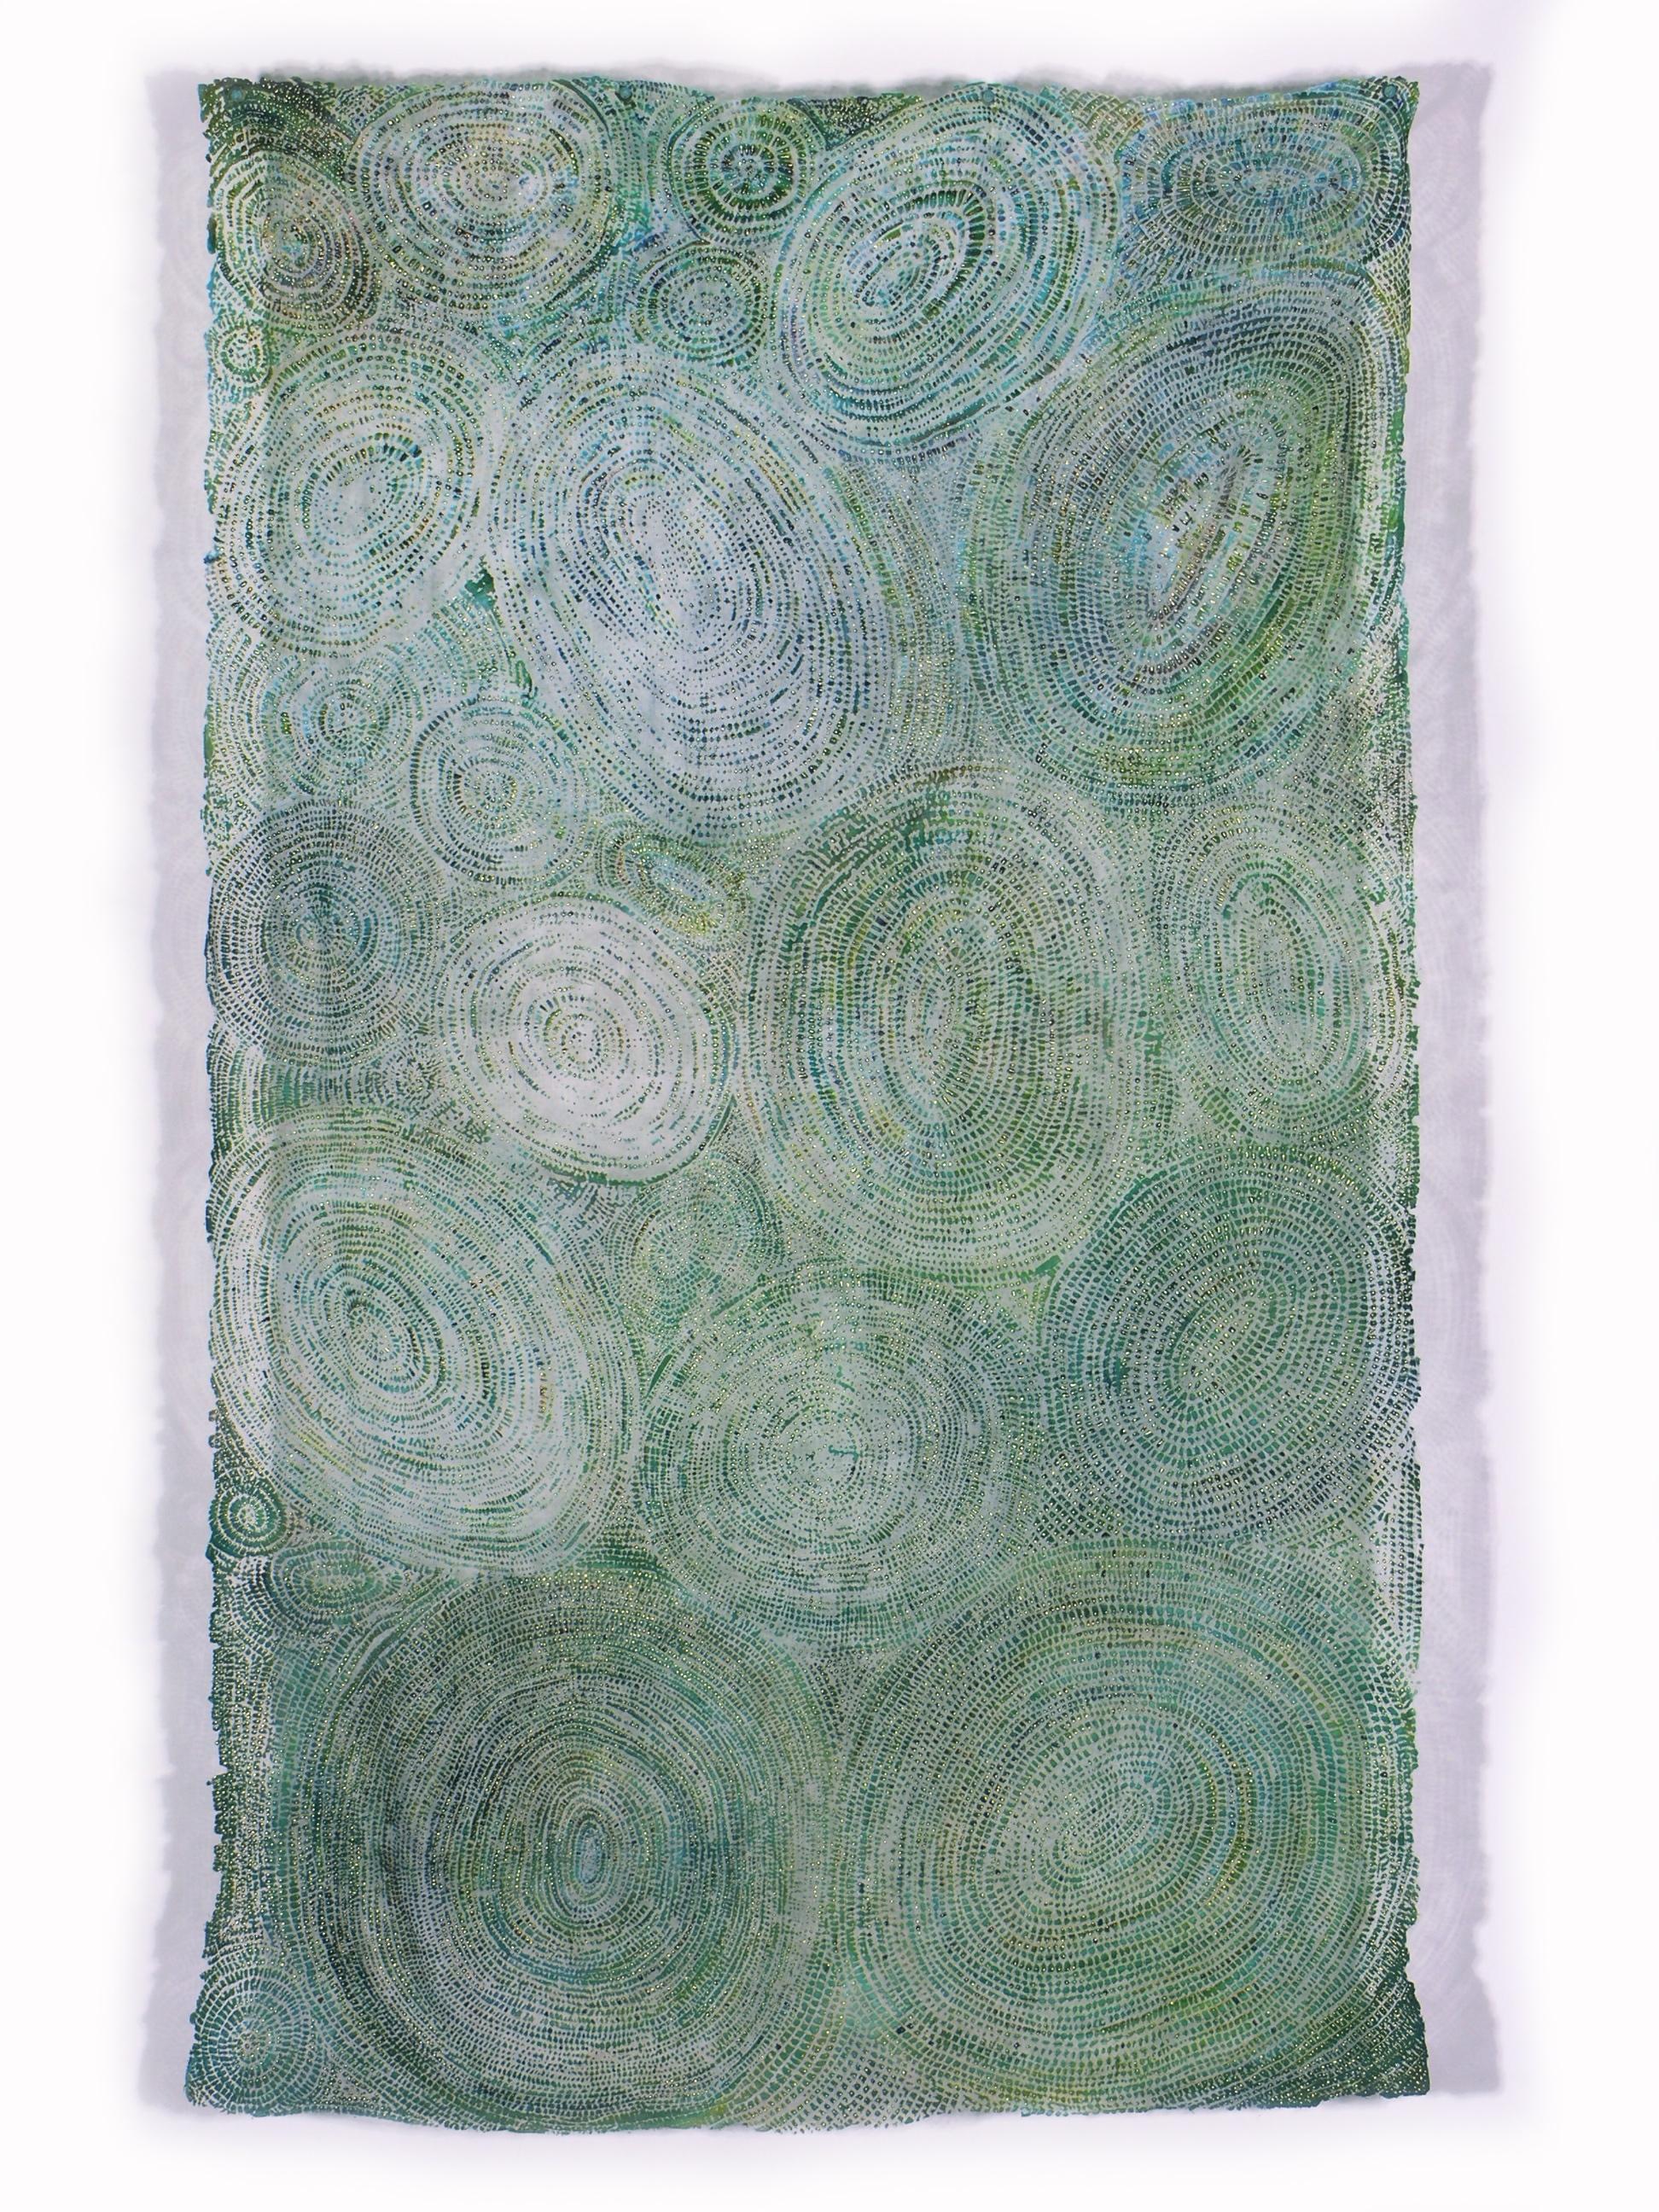 "Soulskin: Sun, Lake, Dragonfly   linen blend, dye, pigment, gold leaf / devoré 90"" x 54"" 2000"